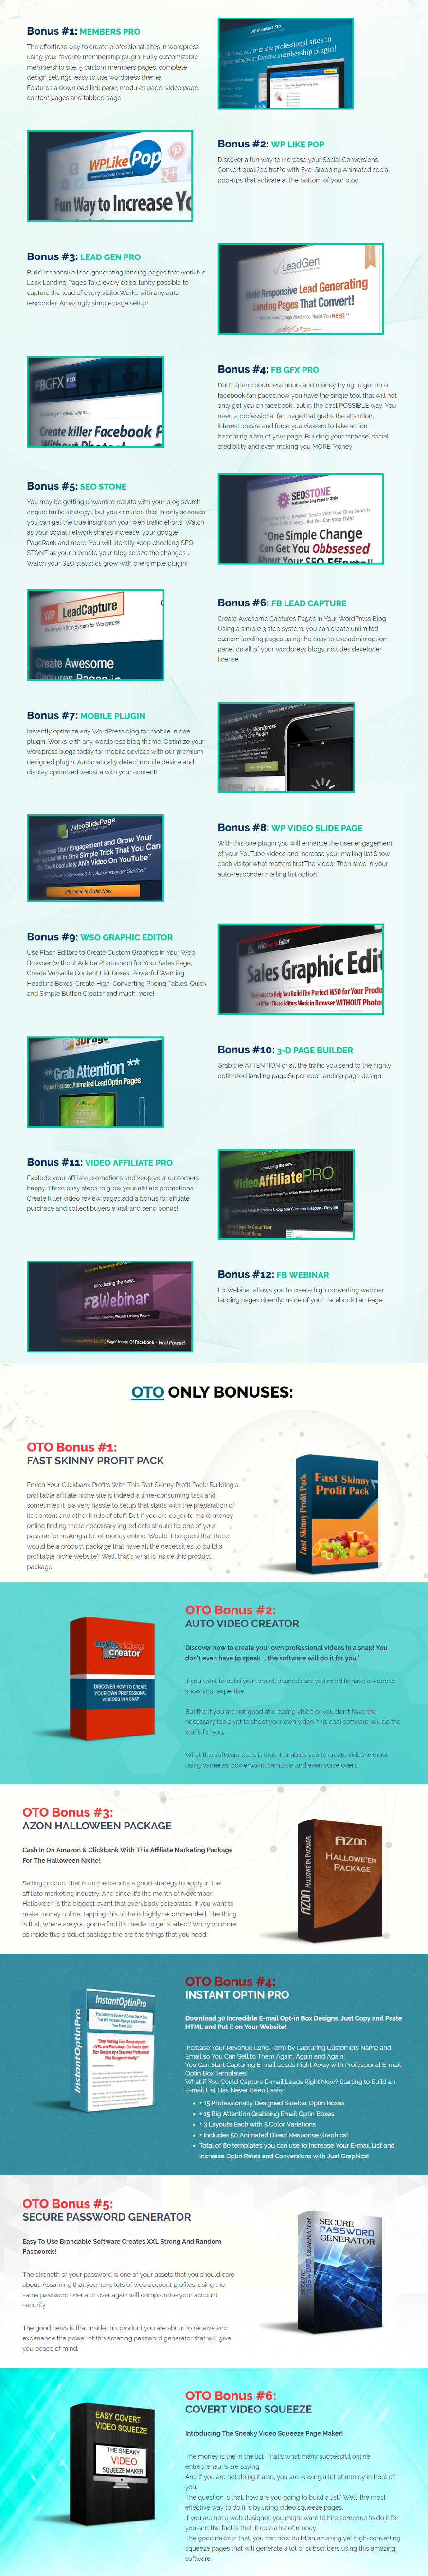 SimplyViral Bonuses